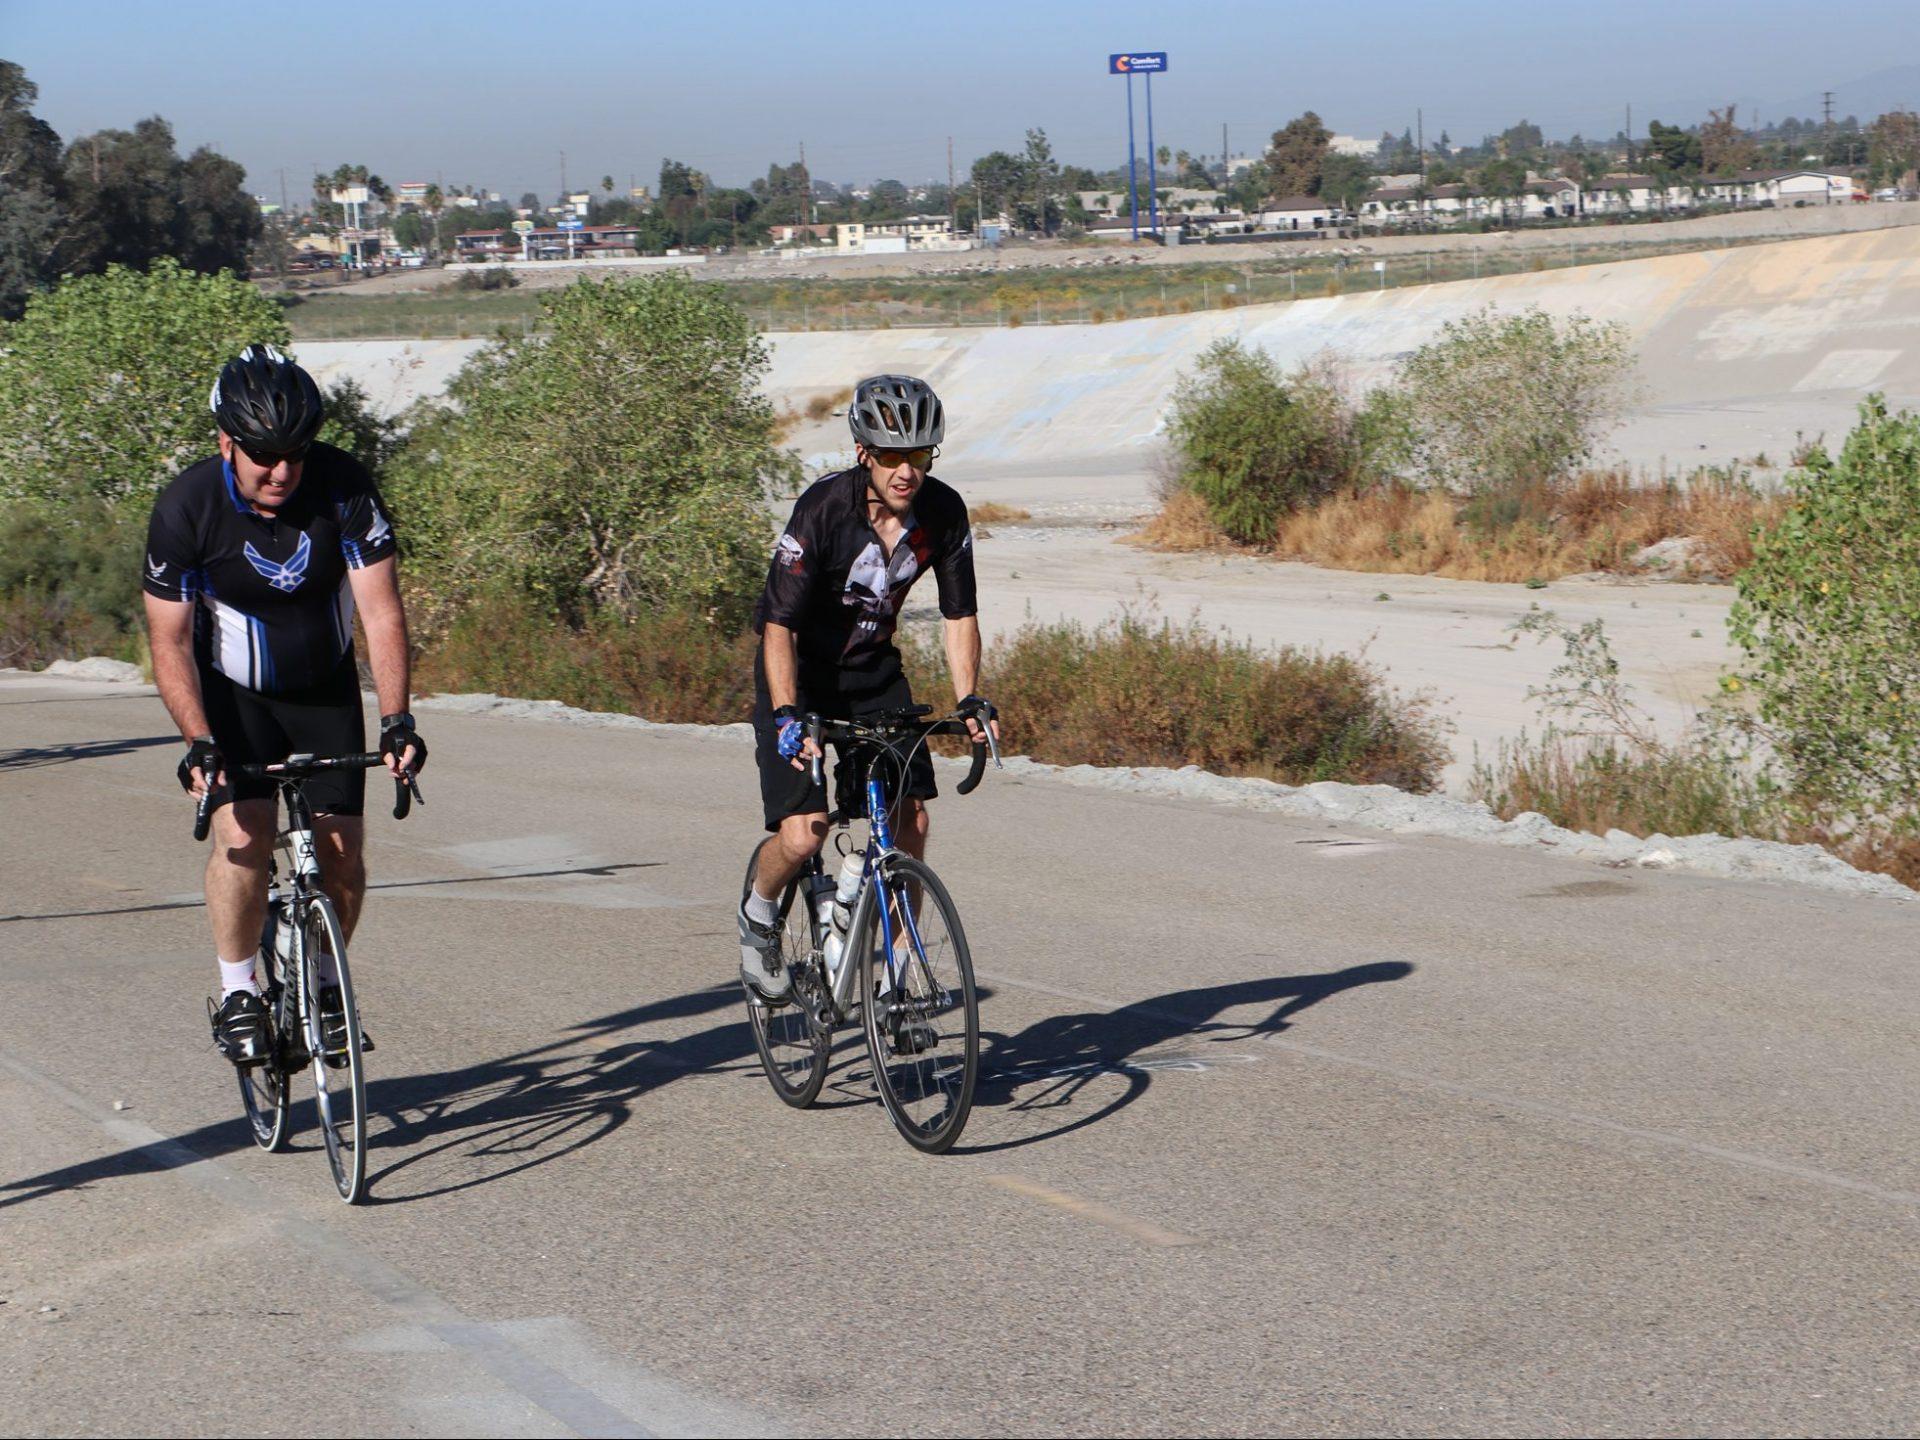 2 men on paved Bike trail 1